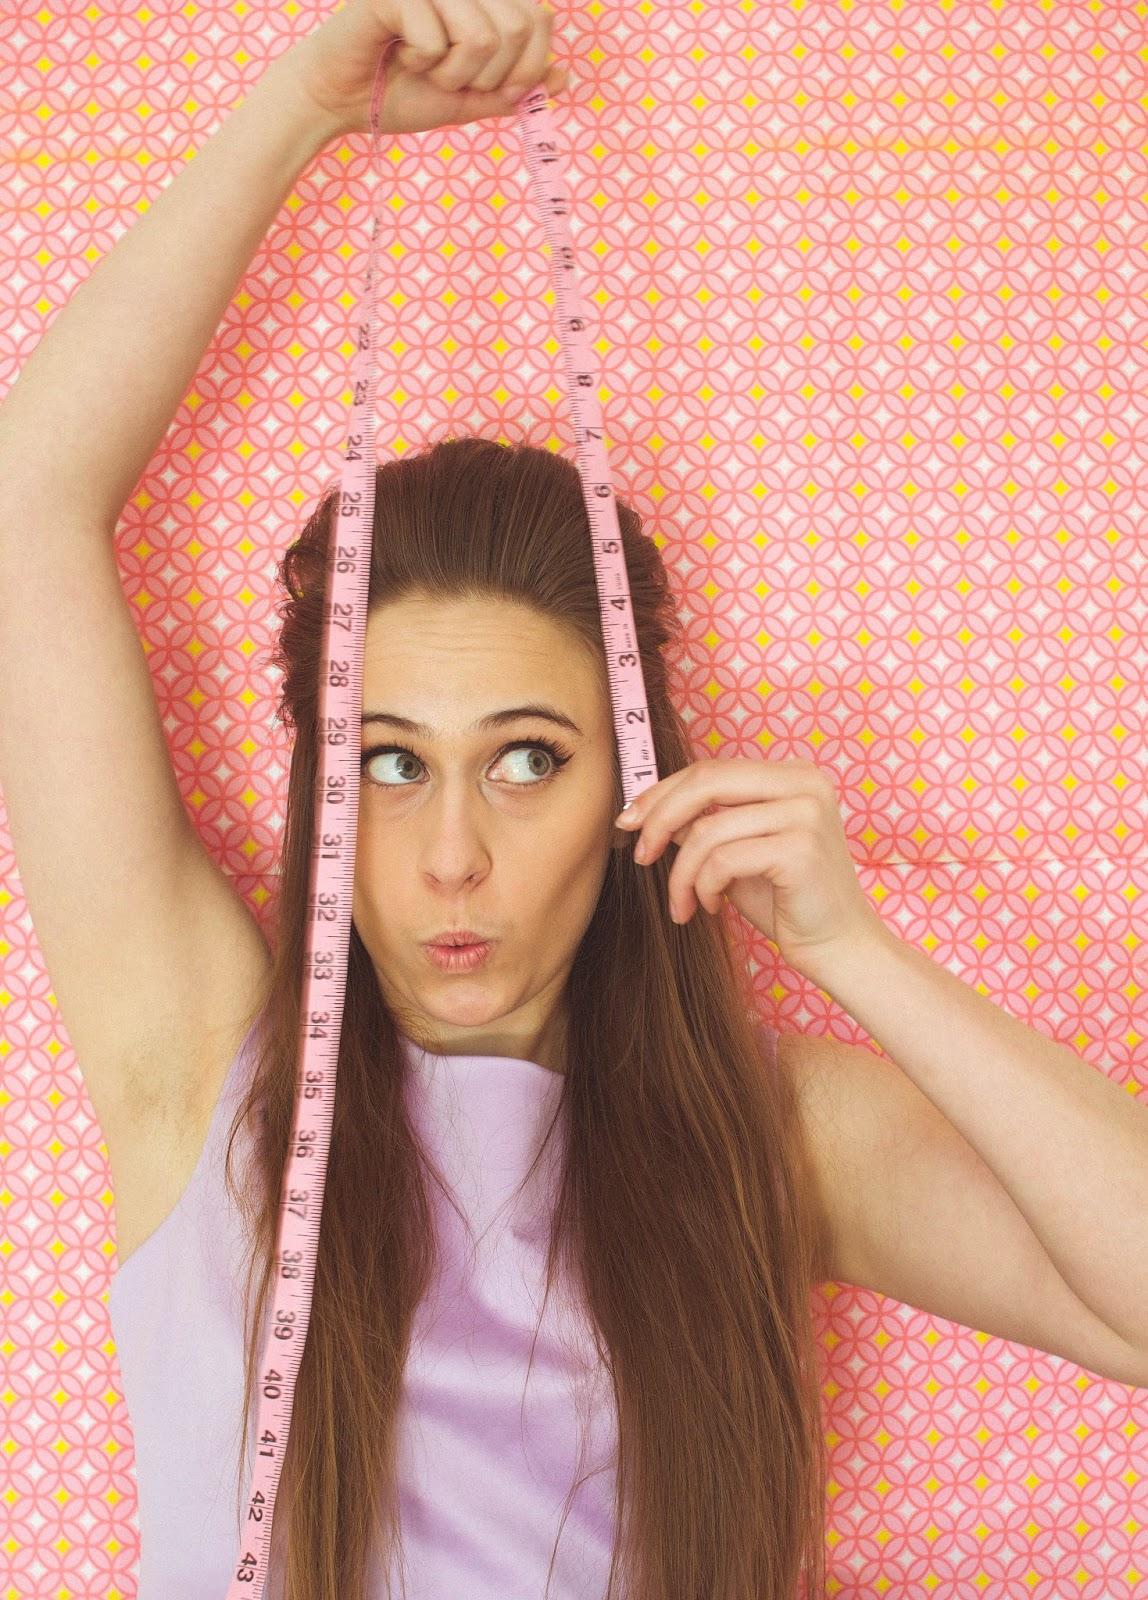 Boufant hair tutorial, lana del rey hair, Priscilla Presley hair, 60's hair, retro hair, tutorial, big hair, volume,bouffant for fine thin hair, fine hair, thin hair volume, teasing tutorial, backcombing tutorial